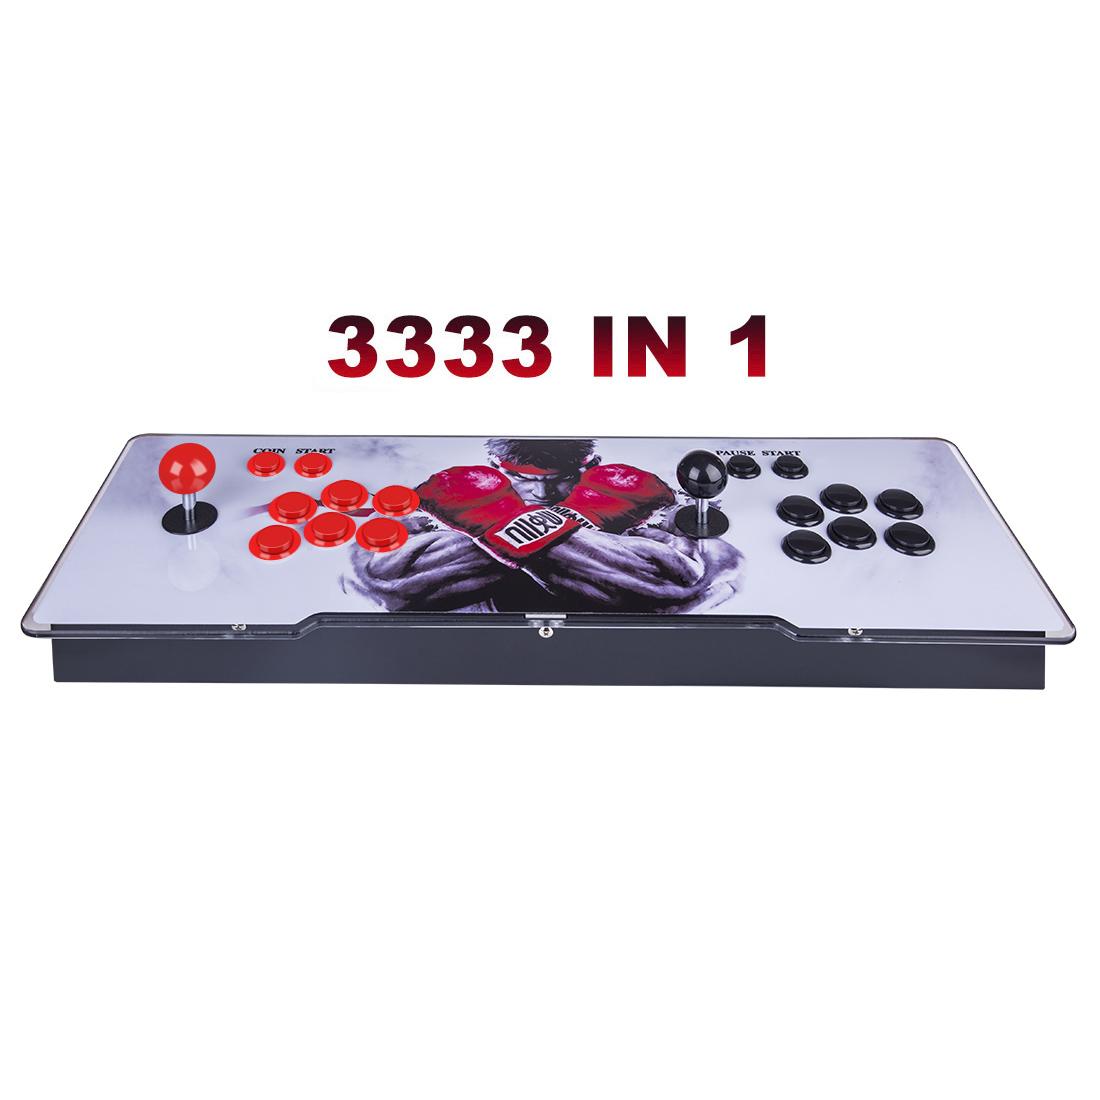 Pandora Box 3D 12S Wifi Version 3333 Games Multi-player Arcade Game Console, Can Download More Games (Artwork: Black Dragon)